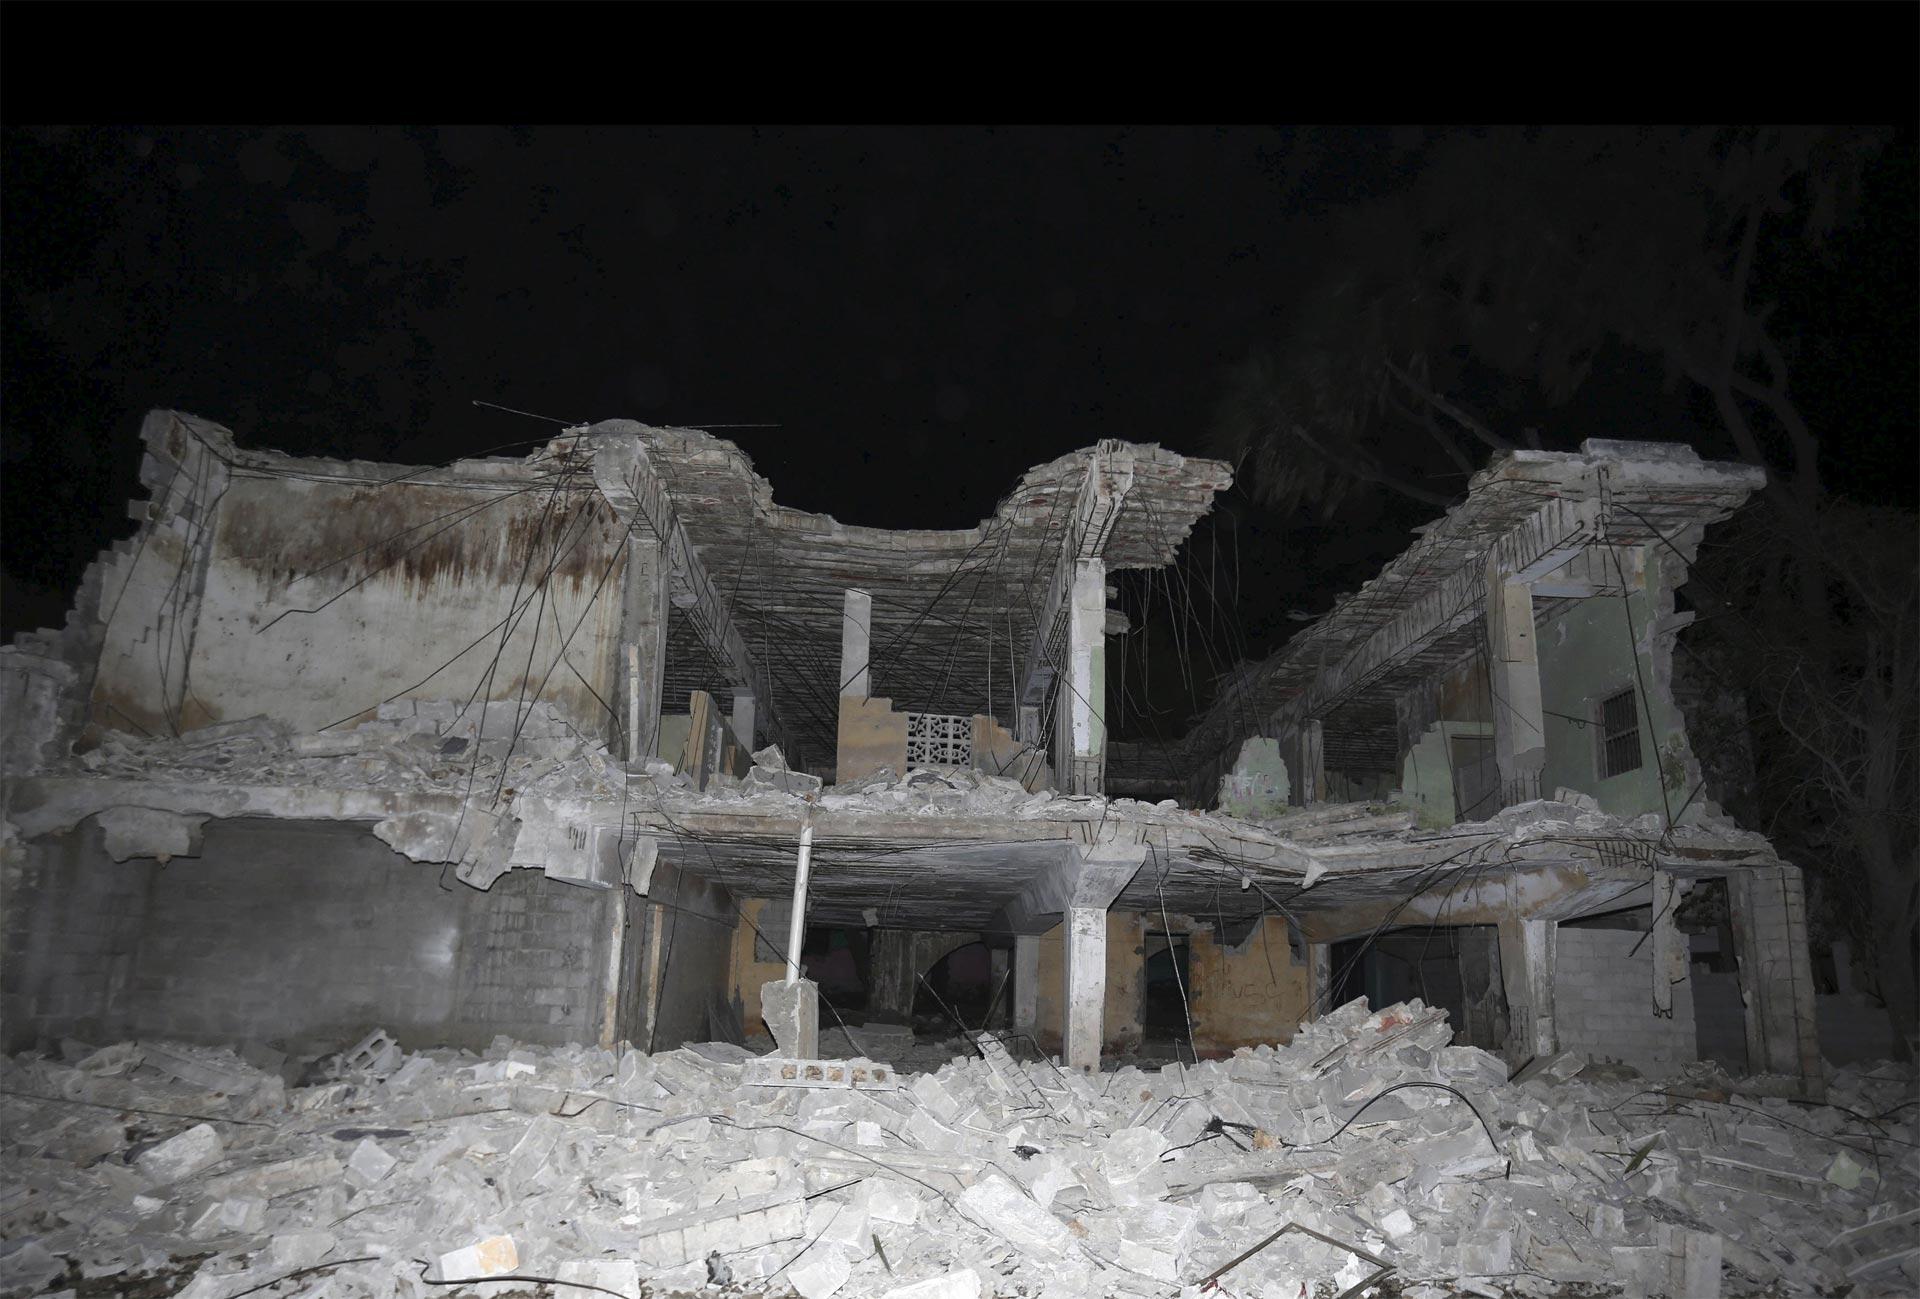 El grupo islamista Al Shabaab se atribuyó el ataque en Mogadiscio